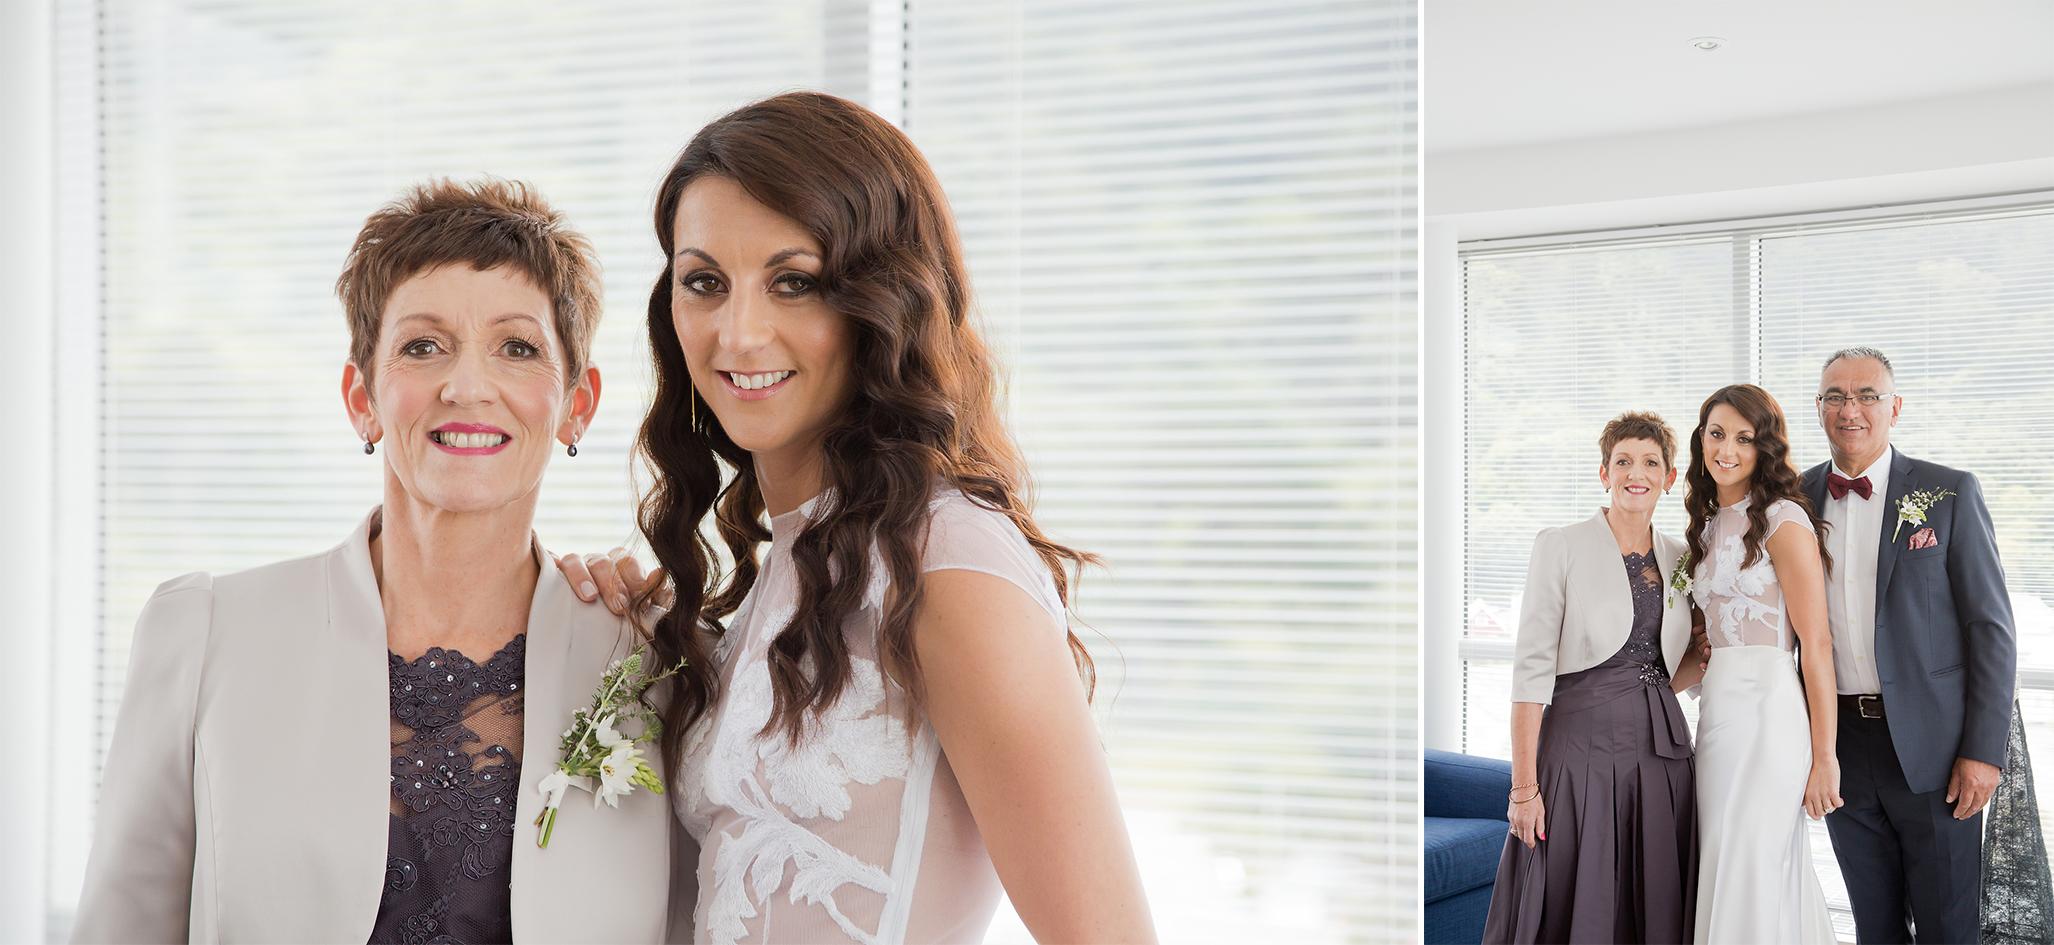 wellington wedding photography NZ - 1188.JPG